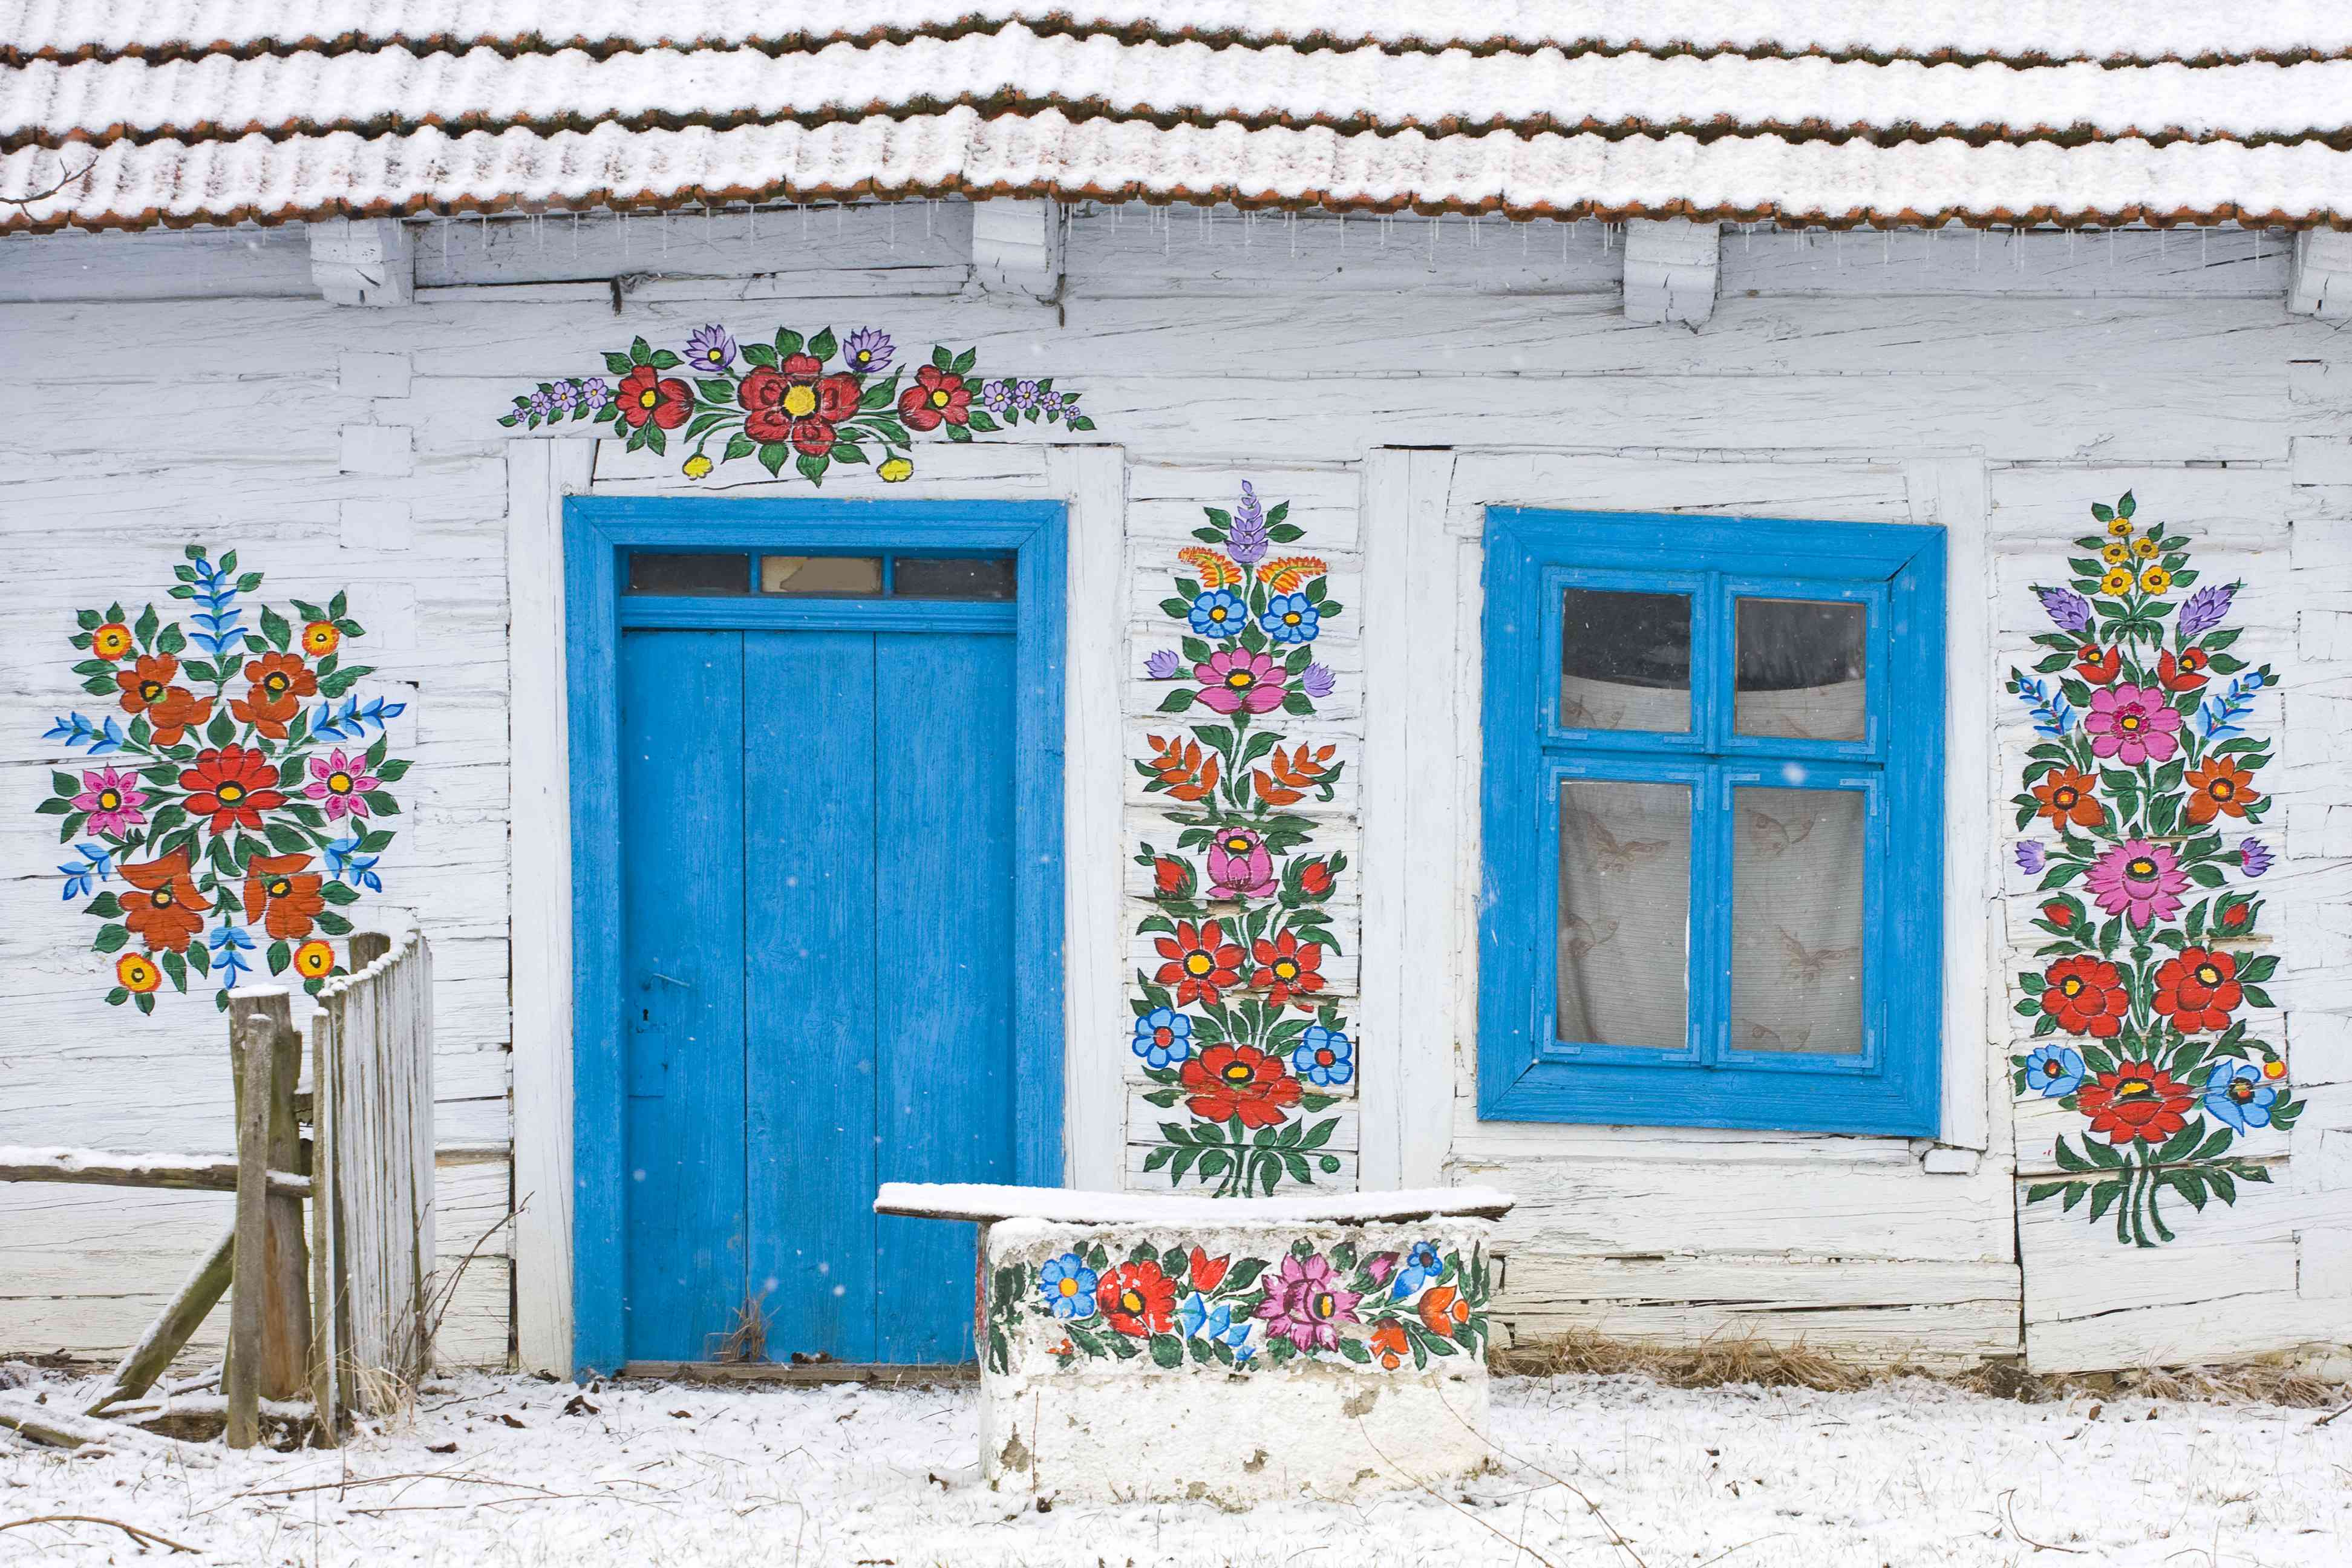 Facade with a folk decoration